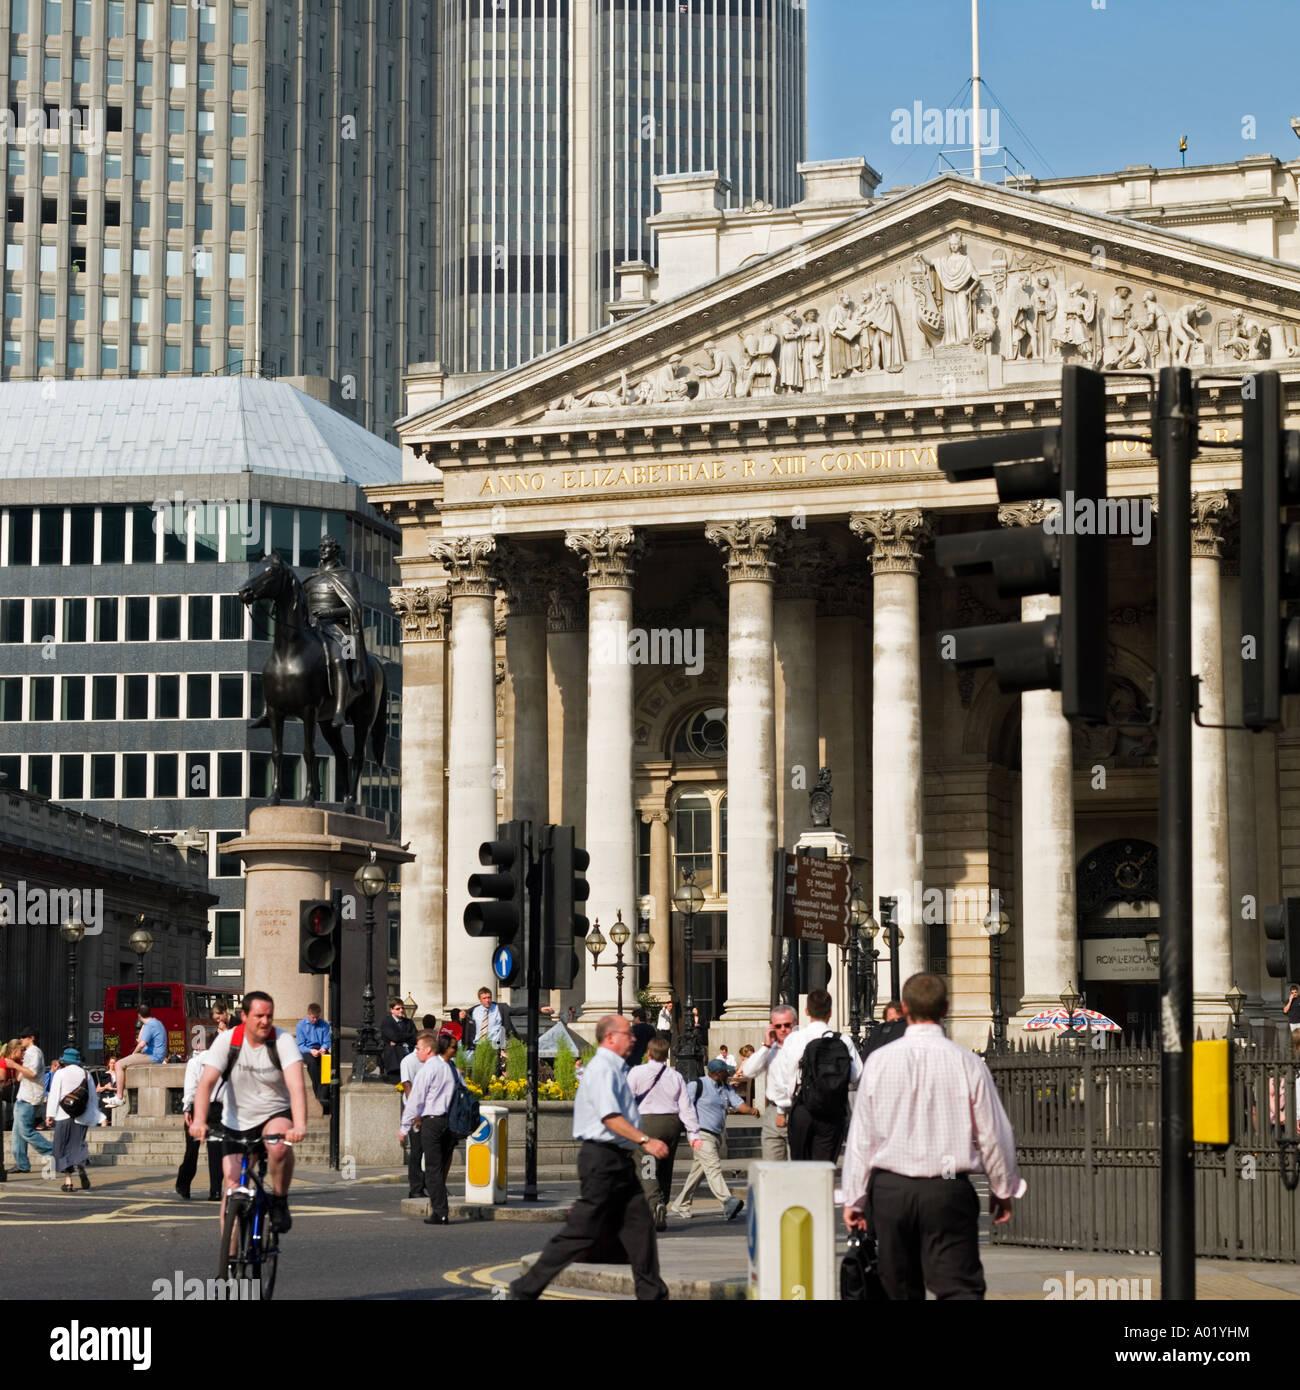 Royal Exchange Cornhill city of London England UK - Stock Image